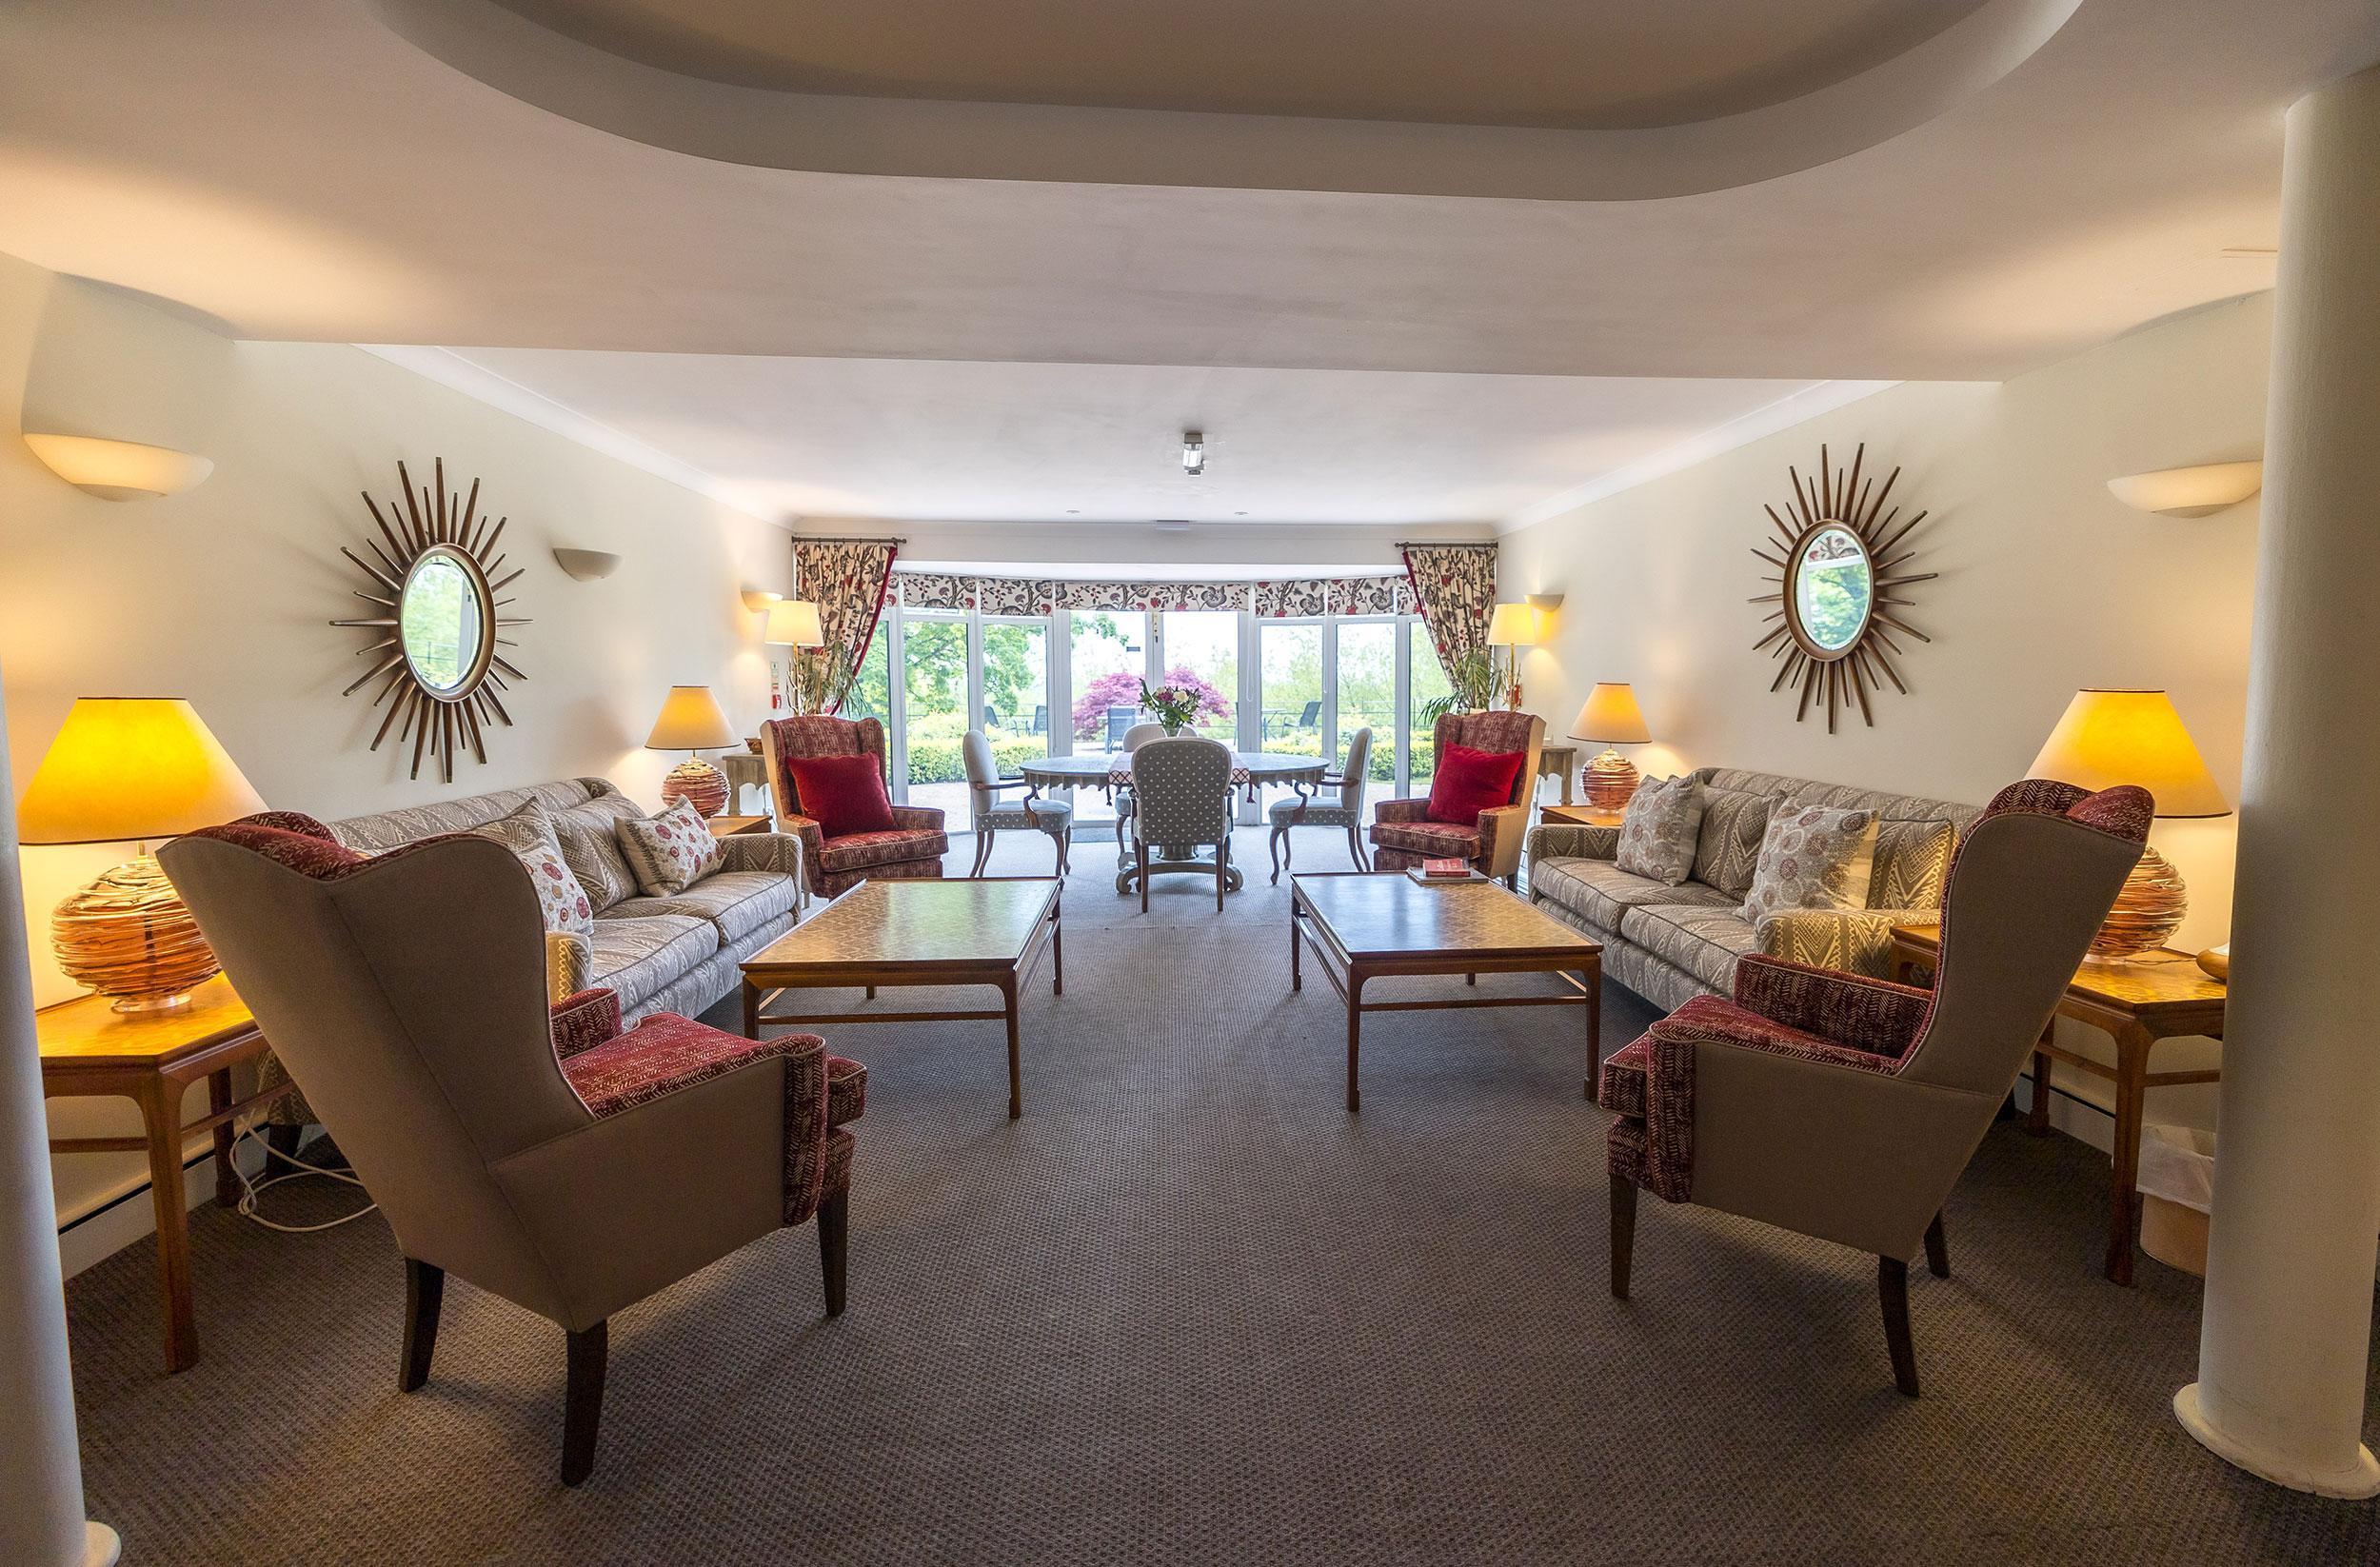 Reception Room designed by William Yeoward Interiors